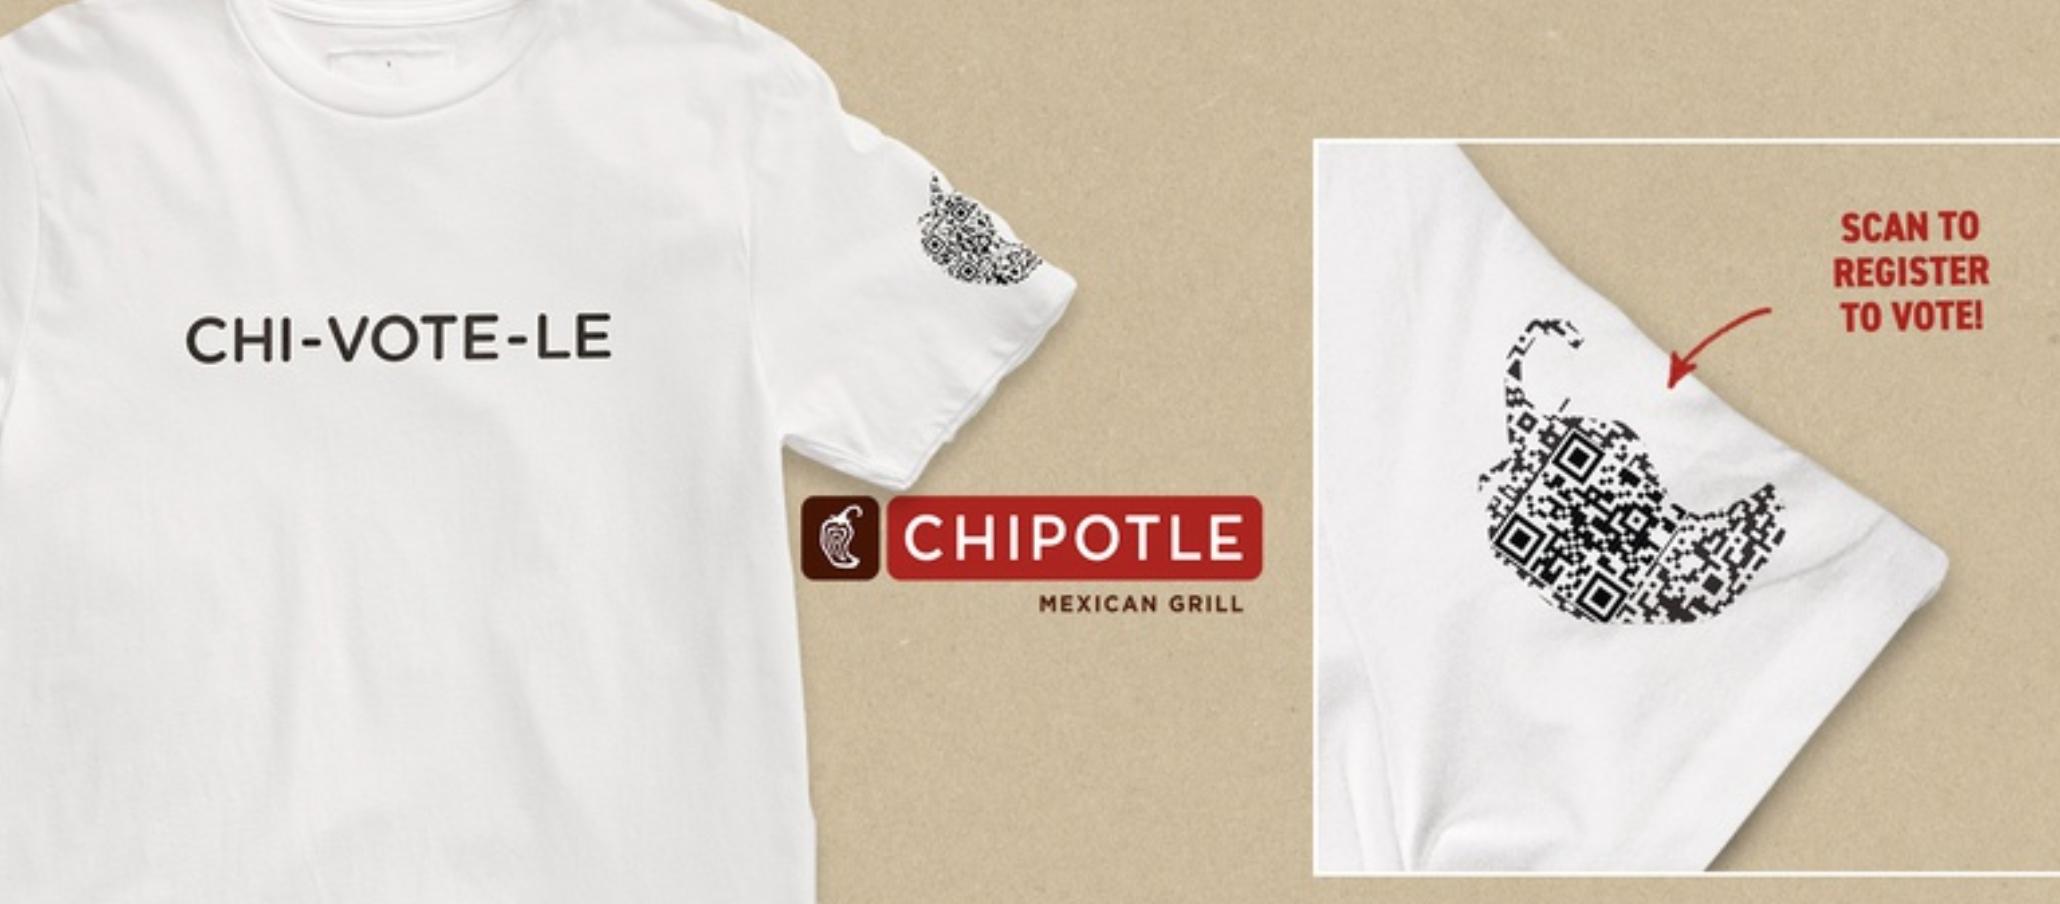 Chipotle T-shirt QR Code